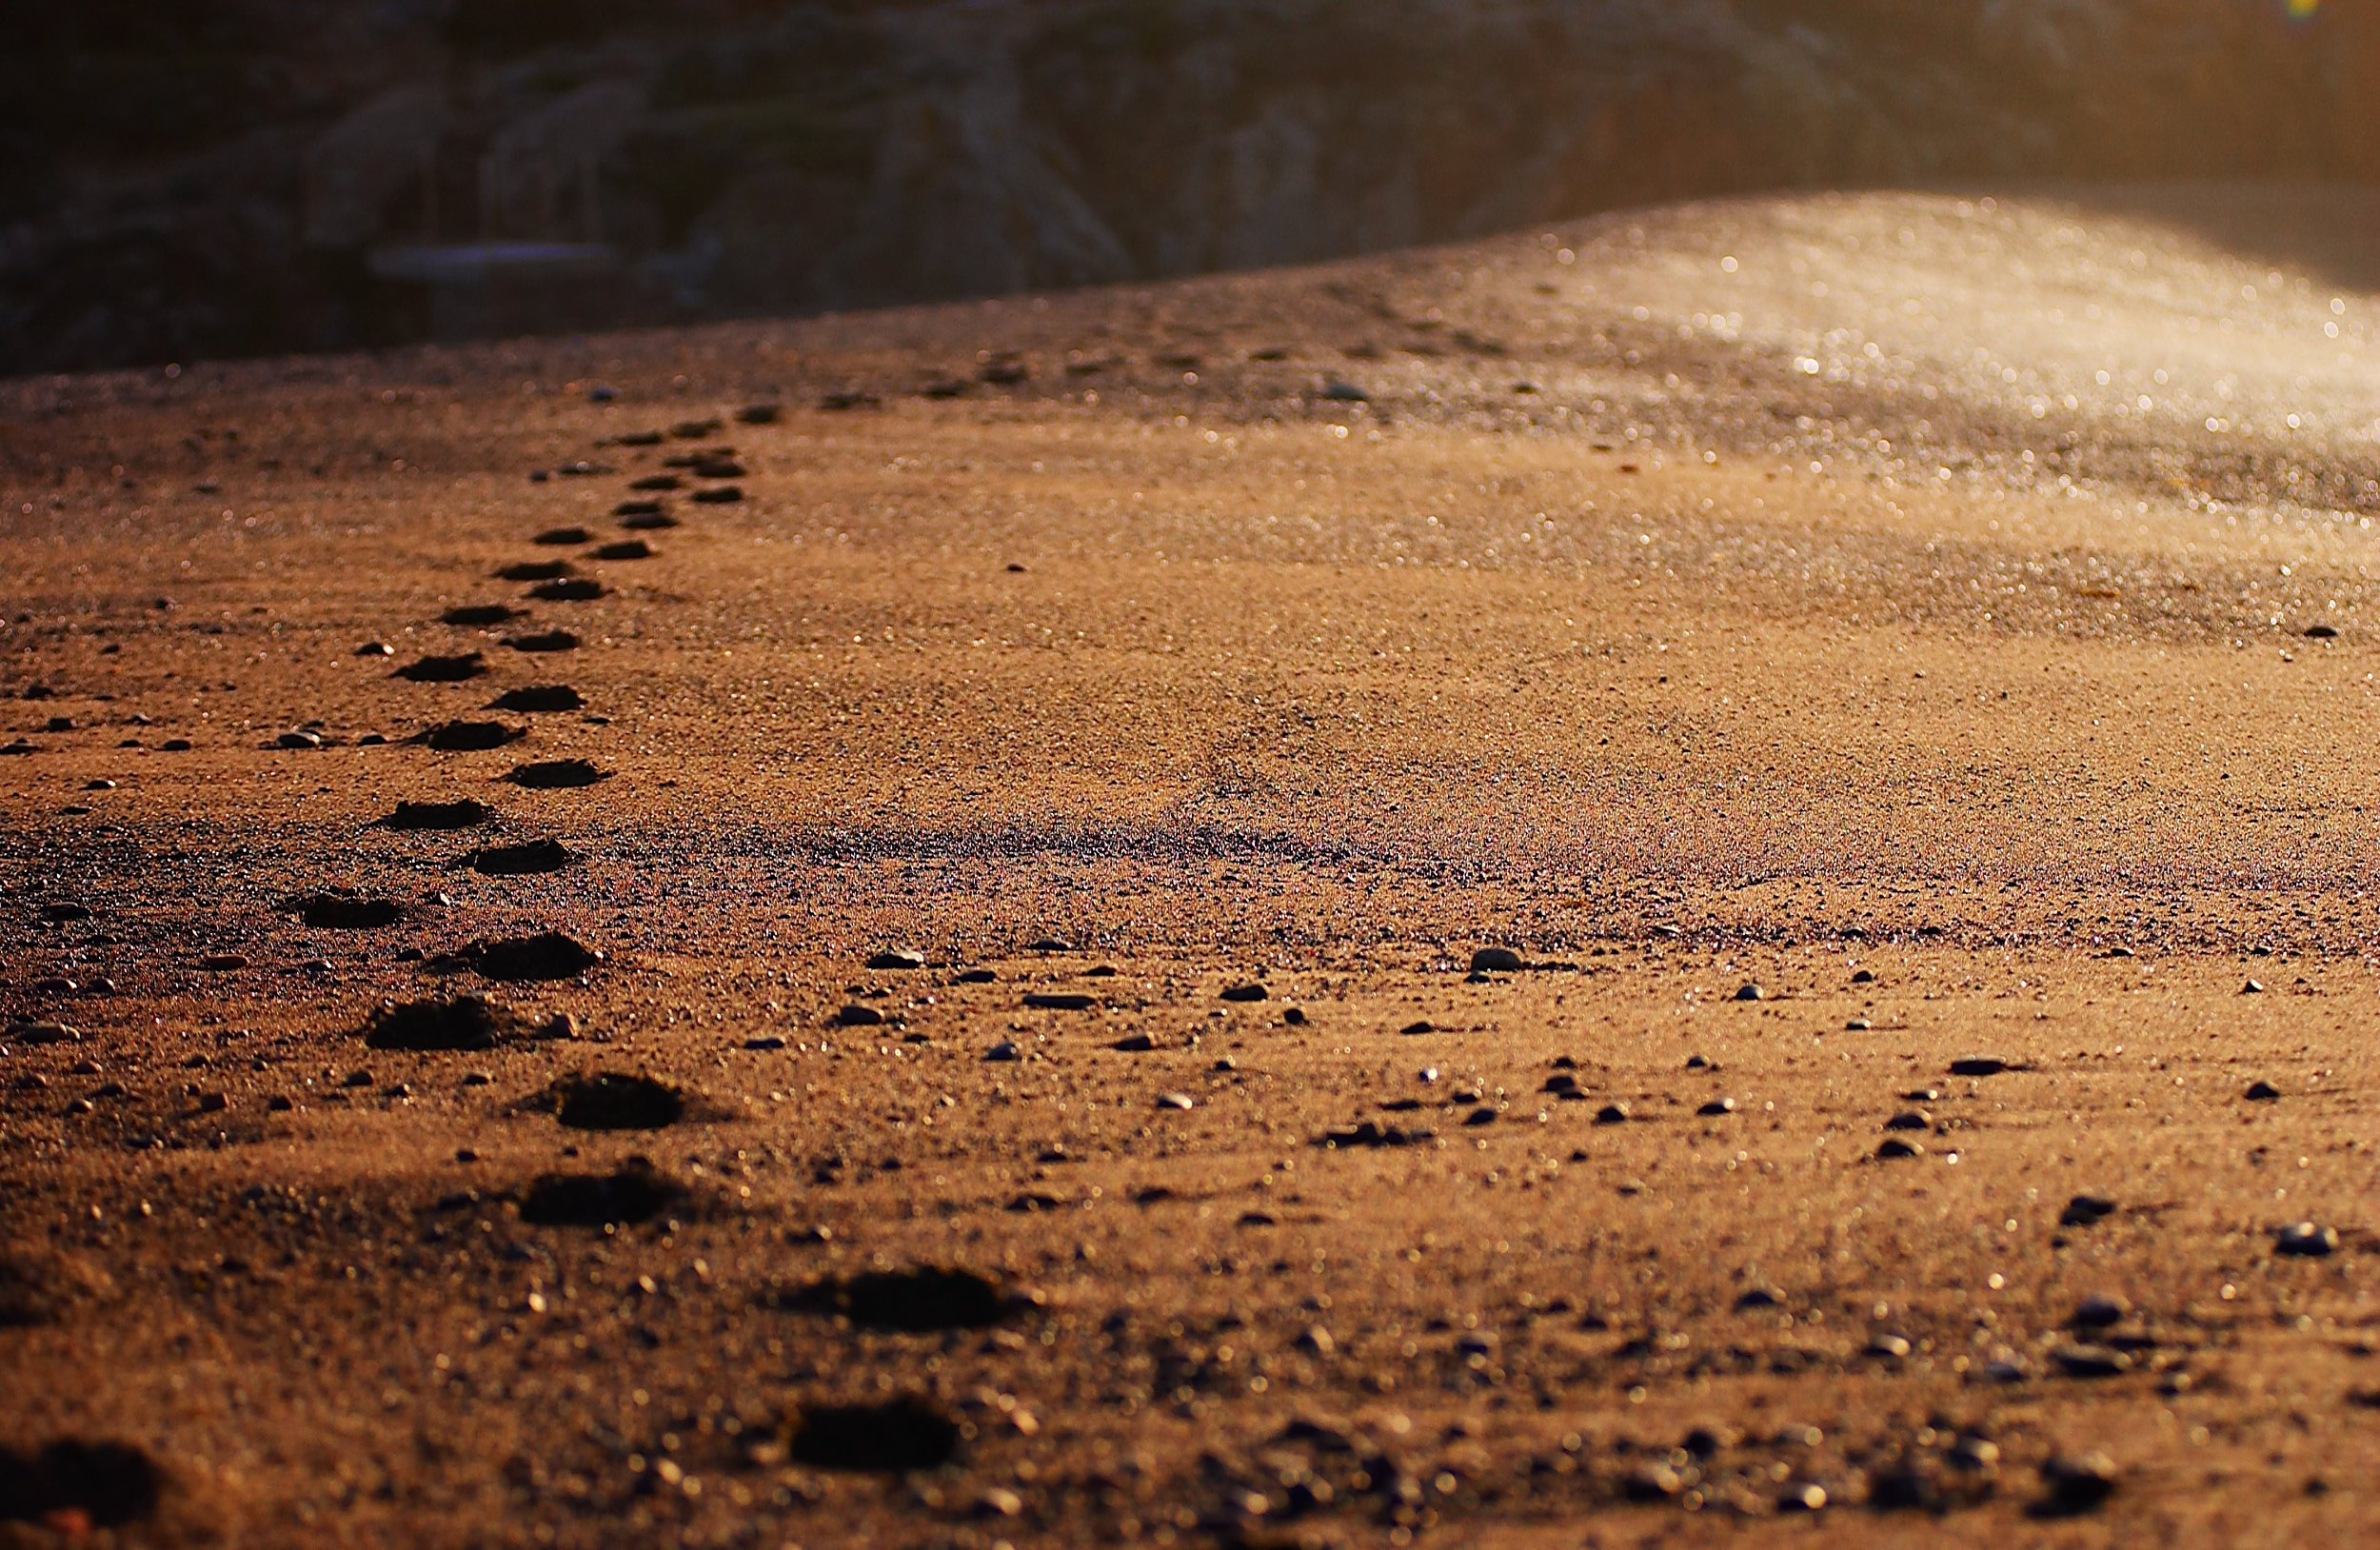 Fodspor i sand.jpg